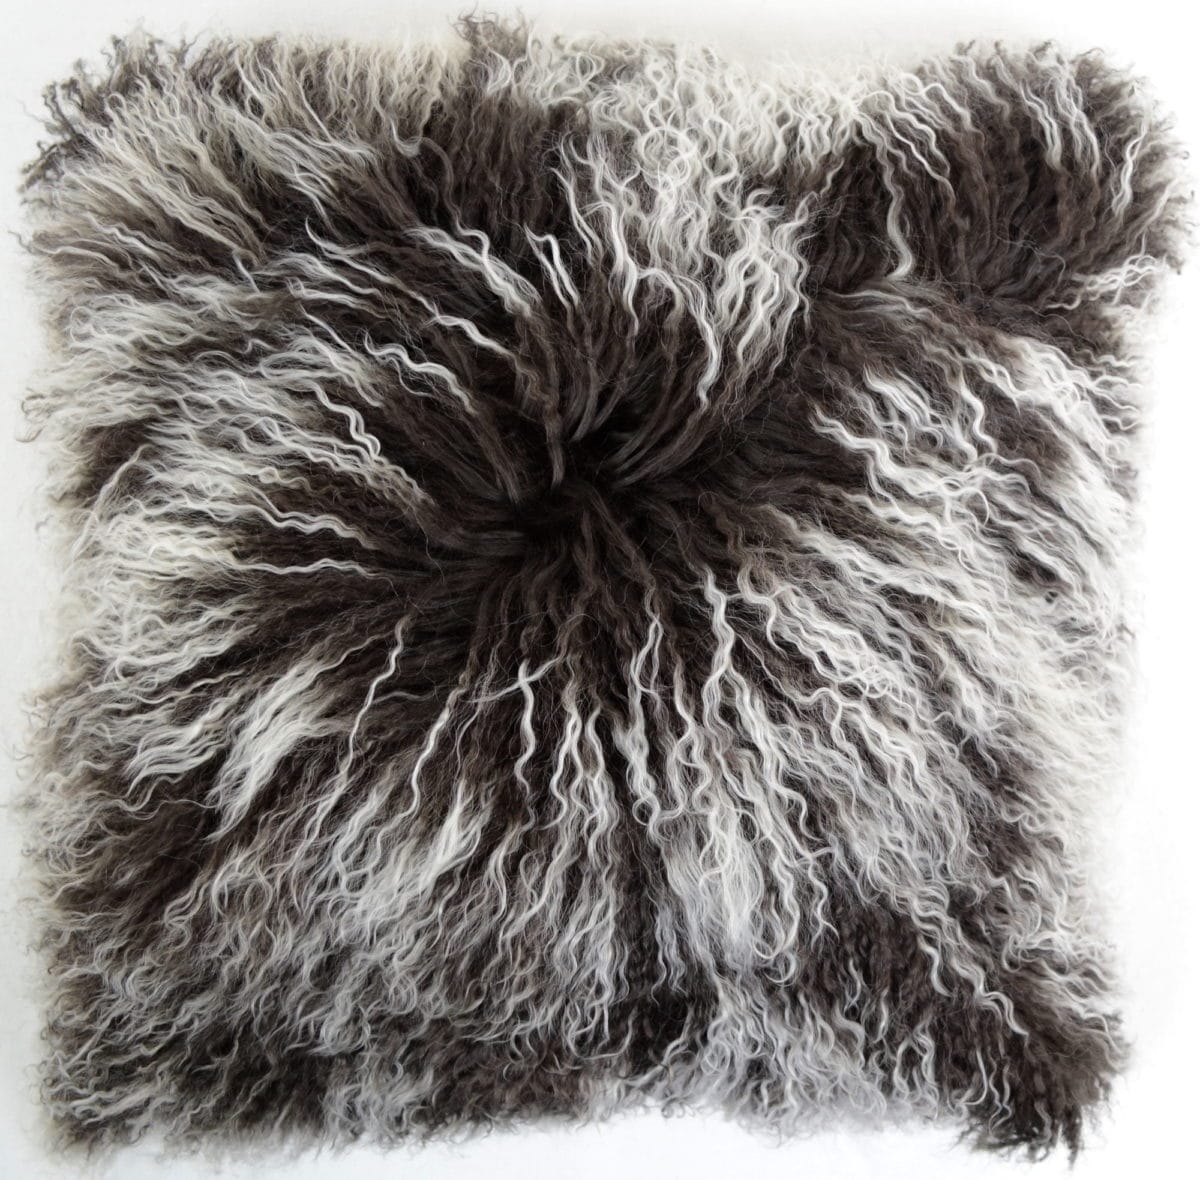 Snugrugs Mongolian Sheepskin Cushion 40cm x 40cm – Brown/White